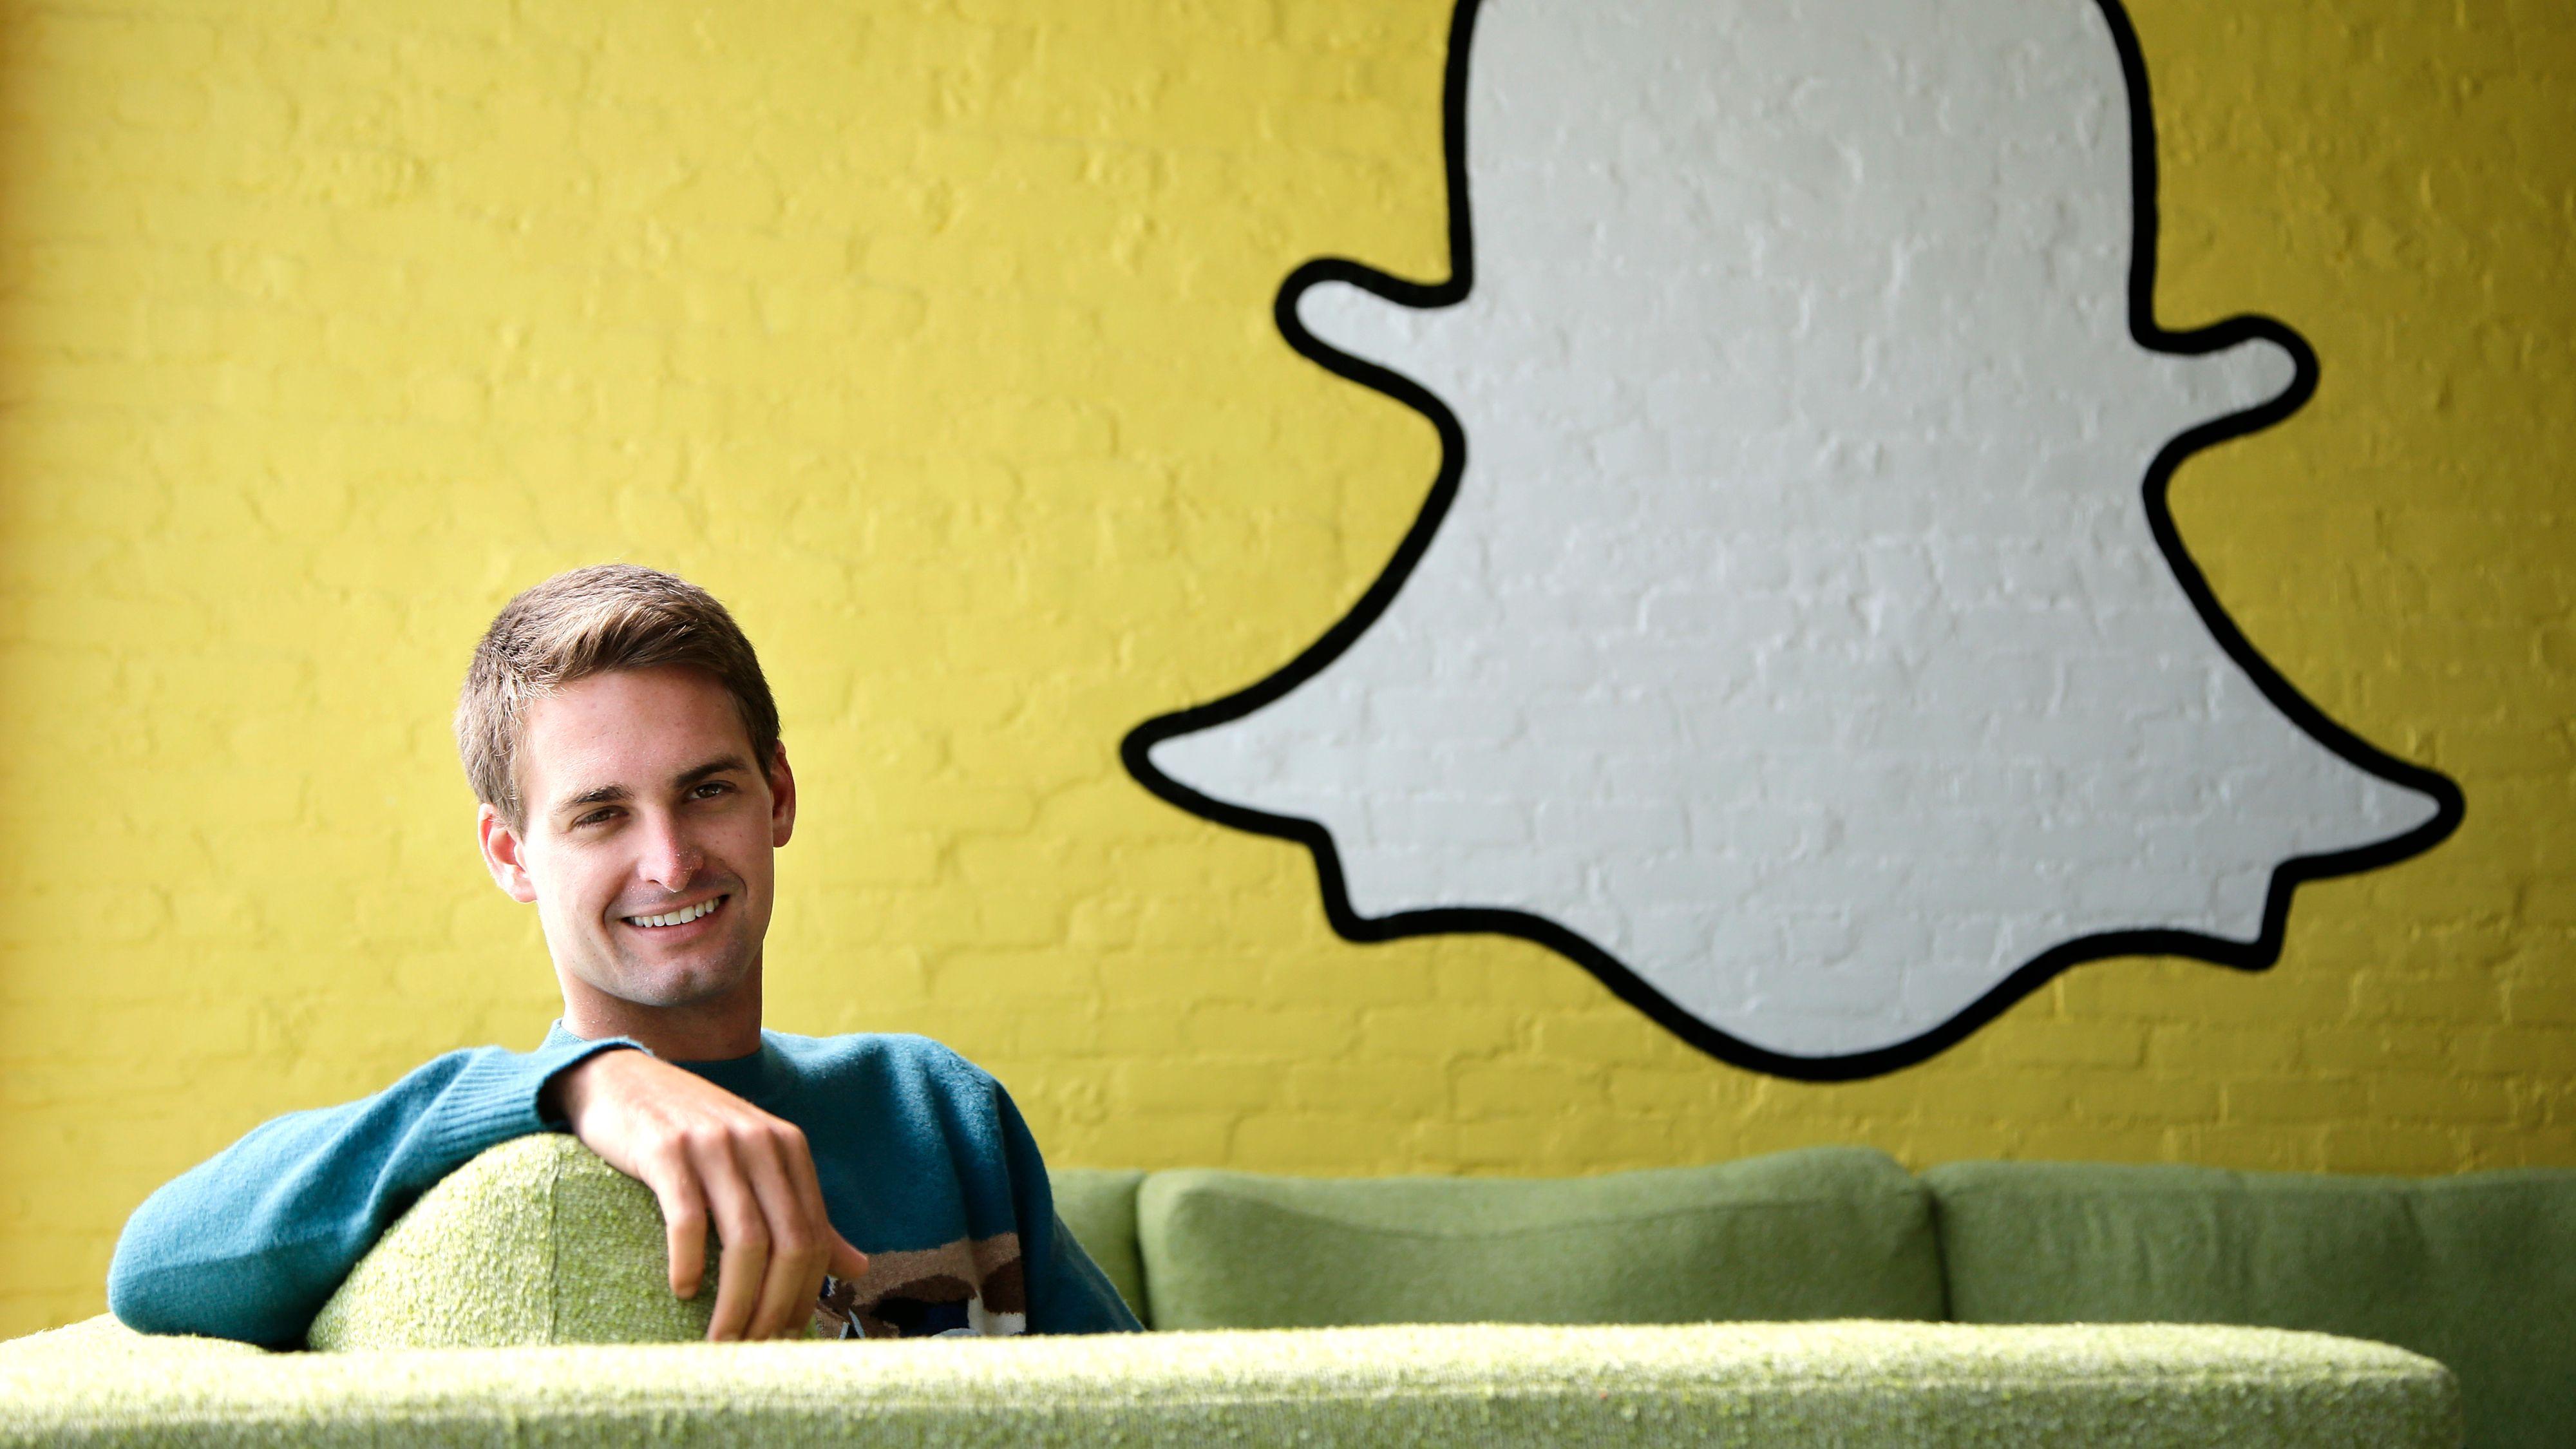 Snapchat-sjefen om Facebook-kopiering: – Vi hadde satt pris på det om de kopierte personvernet også